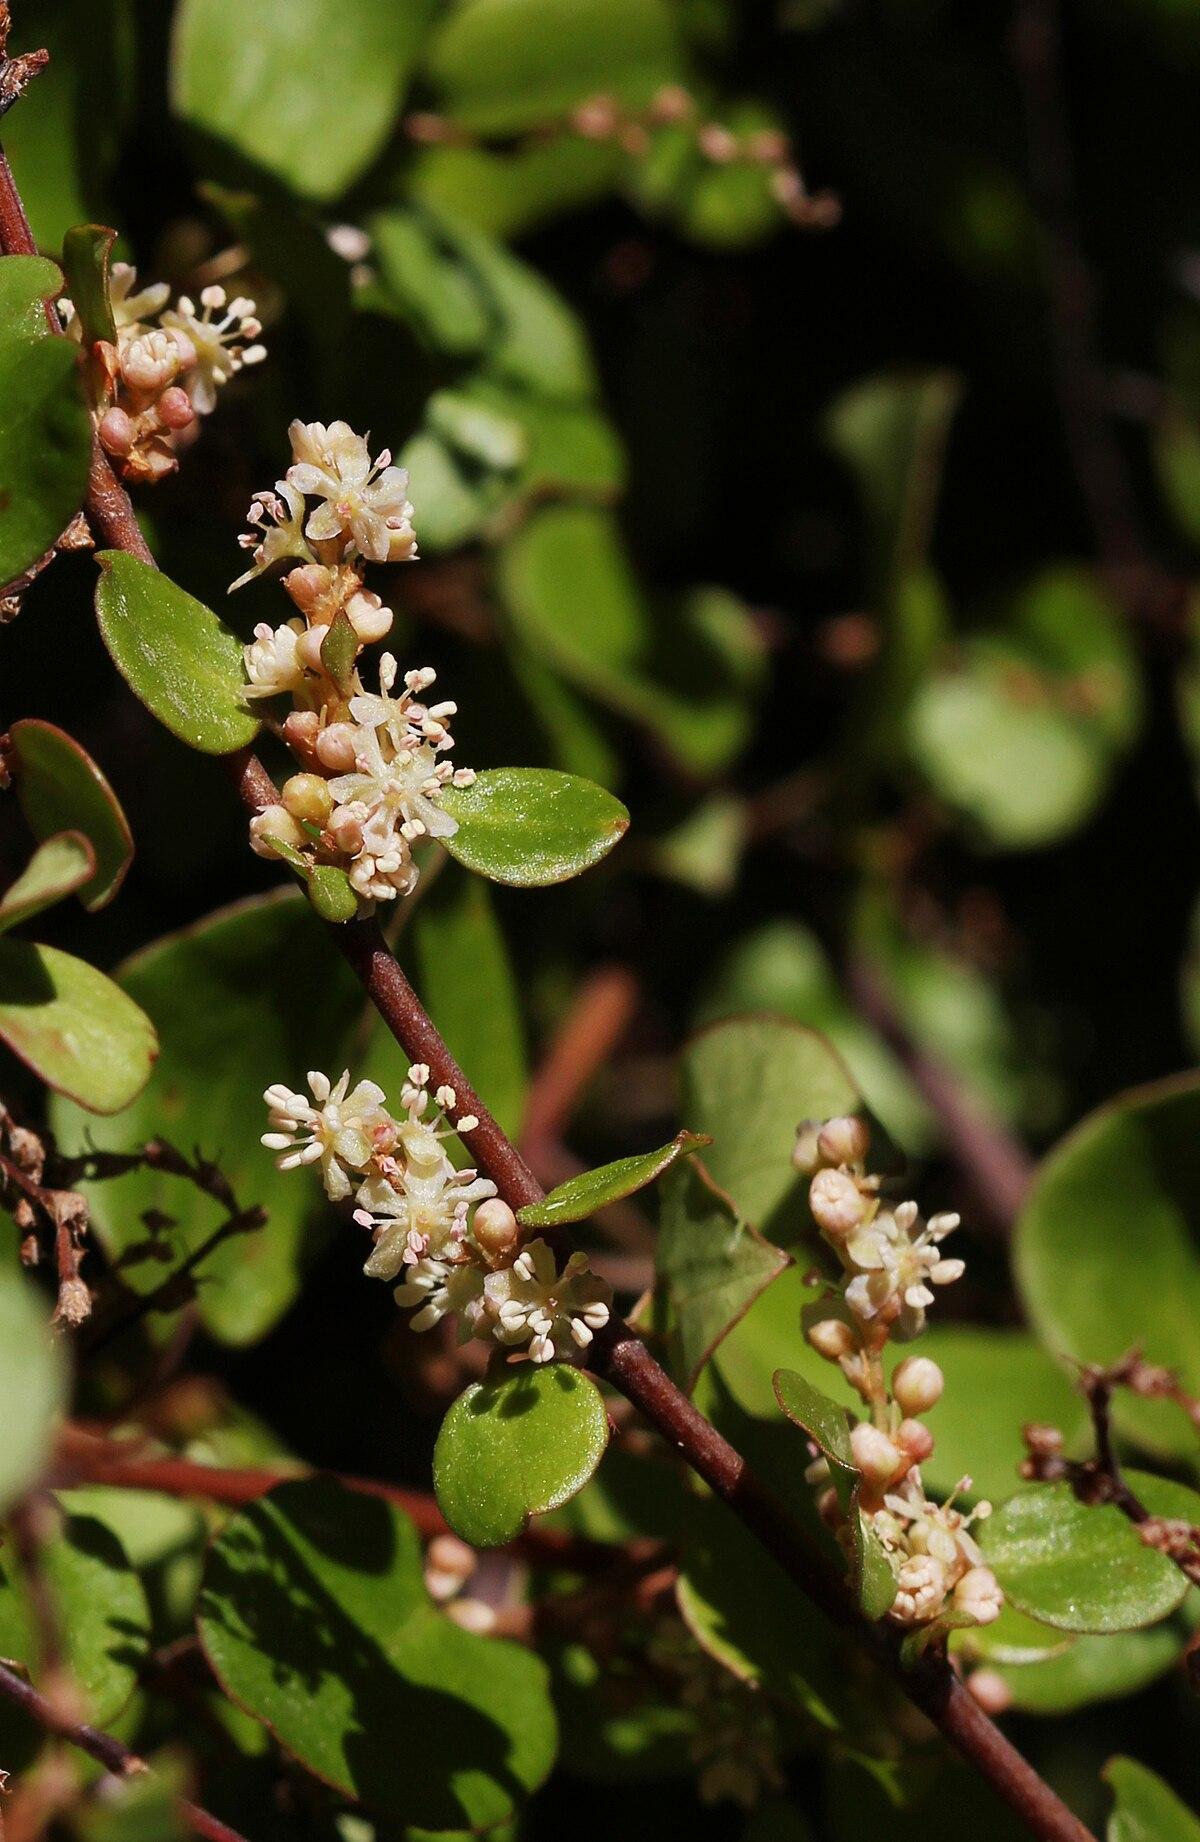 Muehlenbeckia complexa in flower T2i IMG 104 1452.jpg